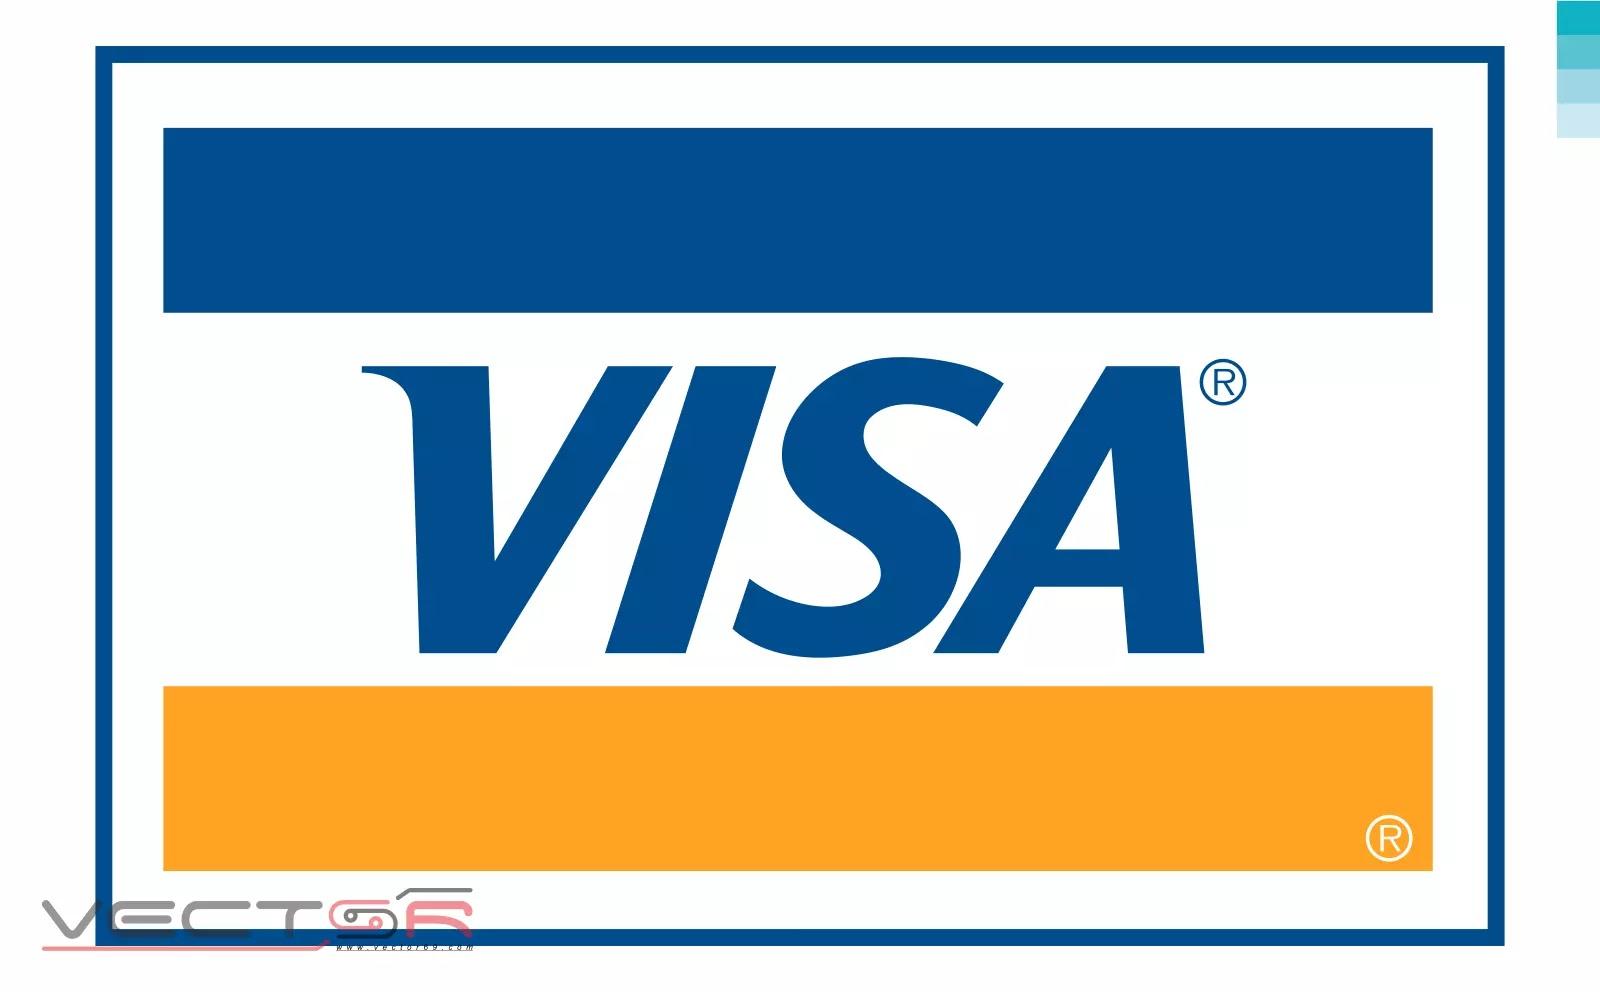 Visa (1992) Logo - Download Vector File SVG (Scalable Vector Graphics)